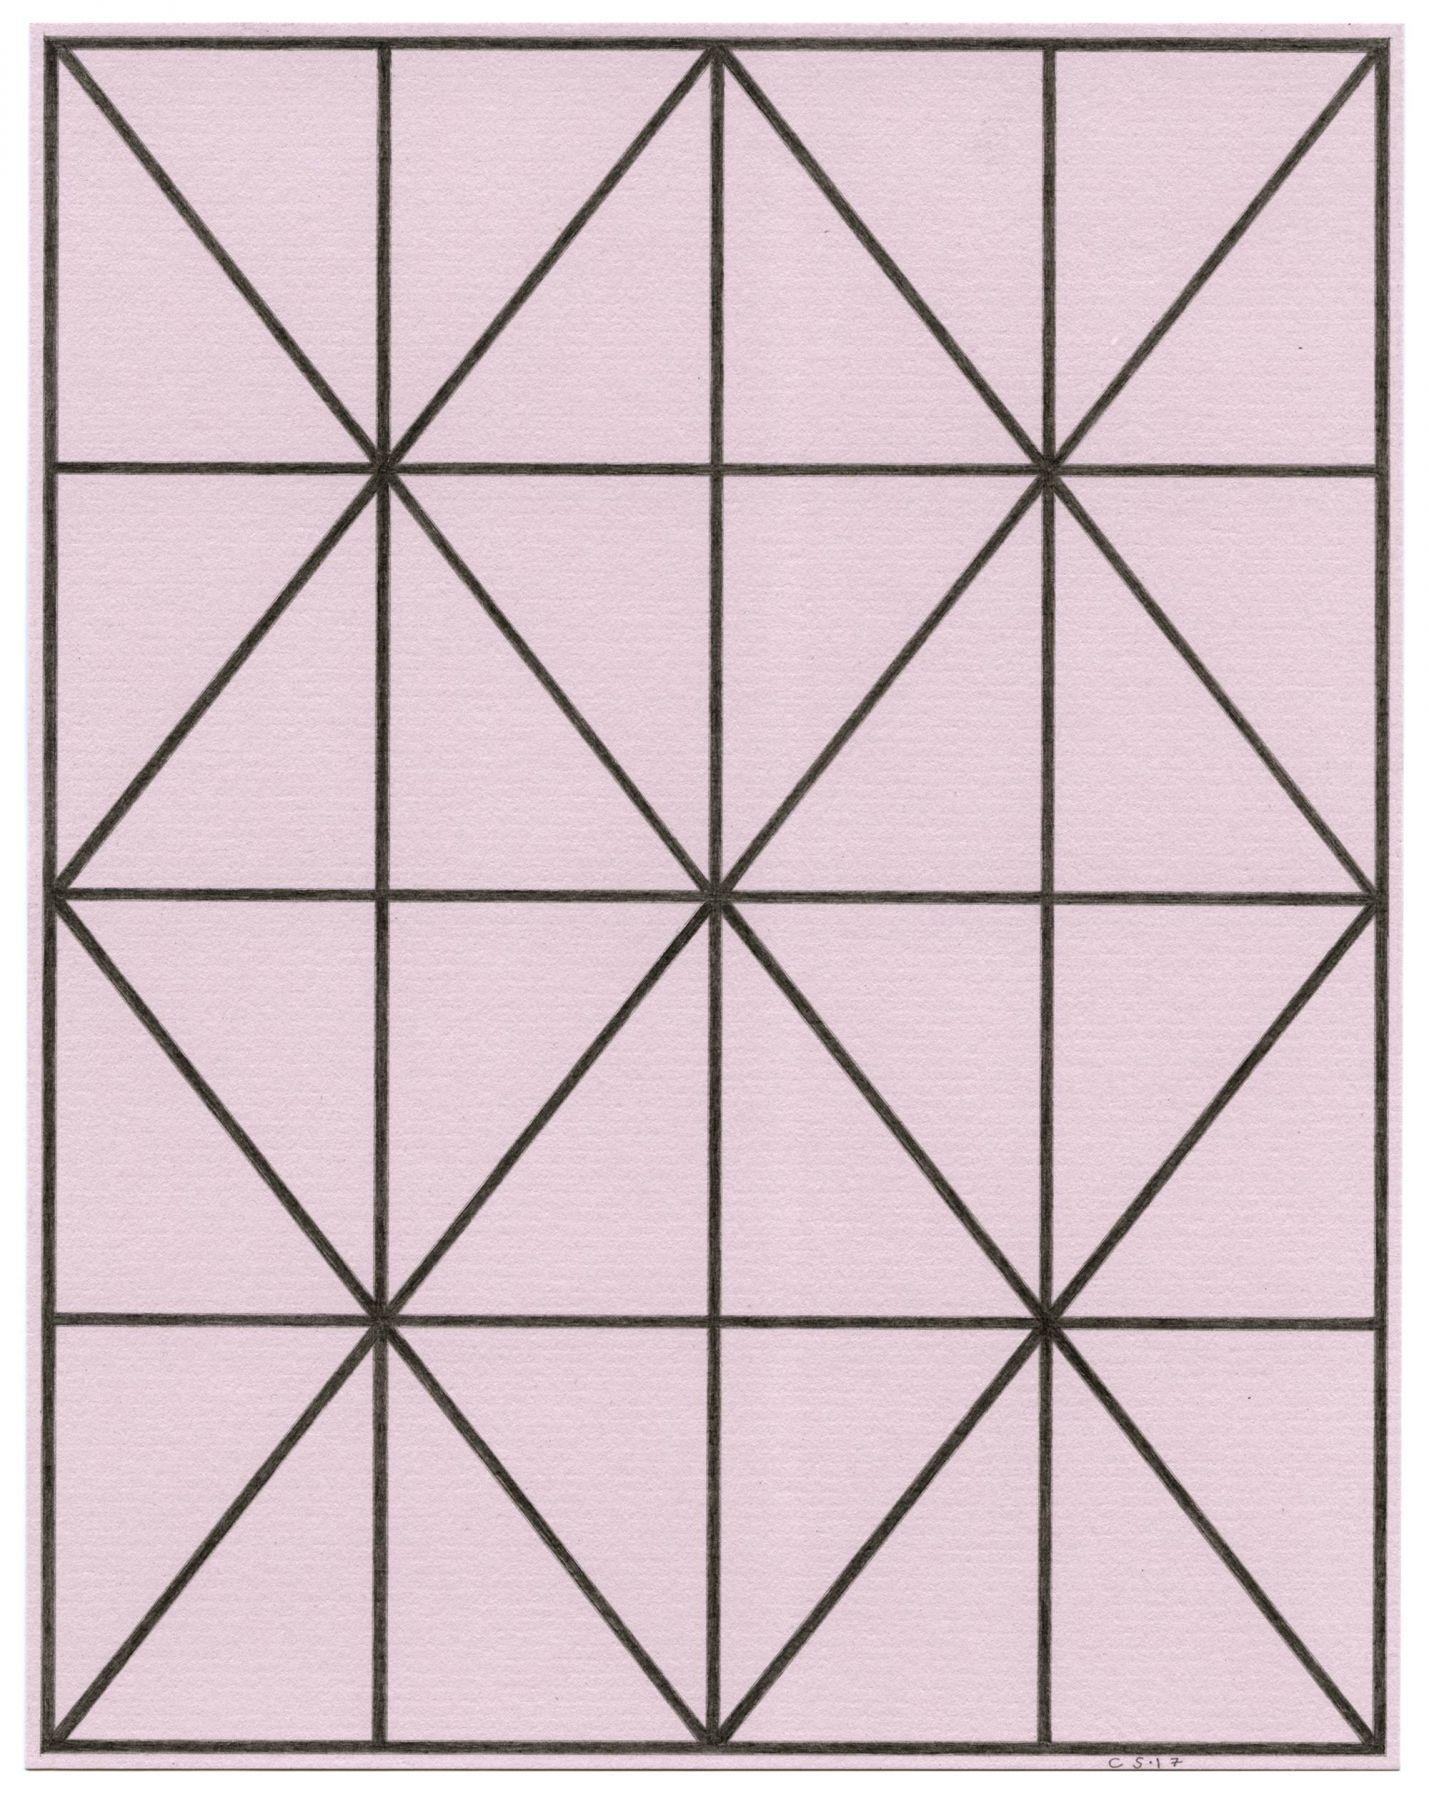 Cary Smith Complex Diagonals #6, 2017